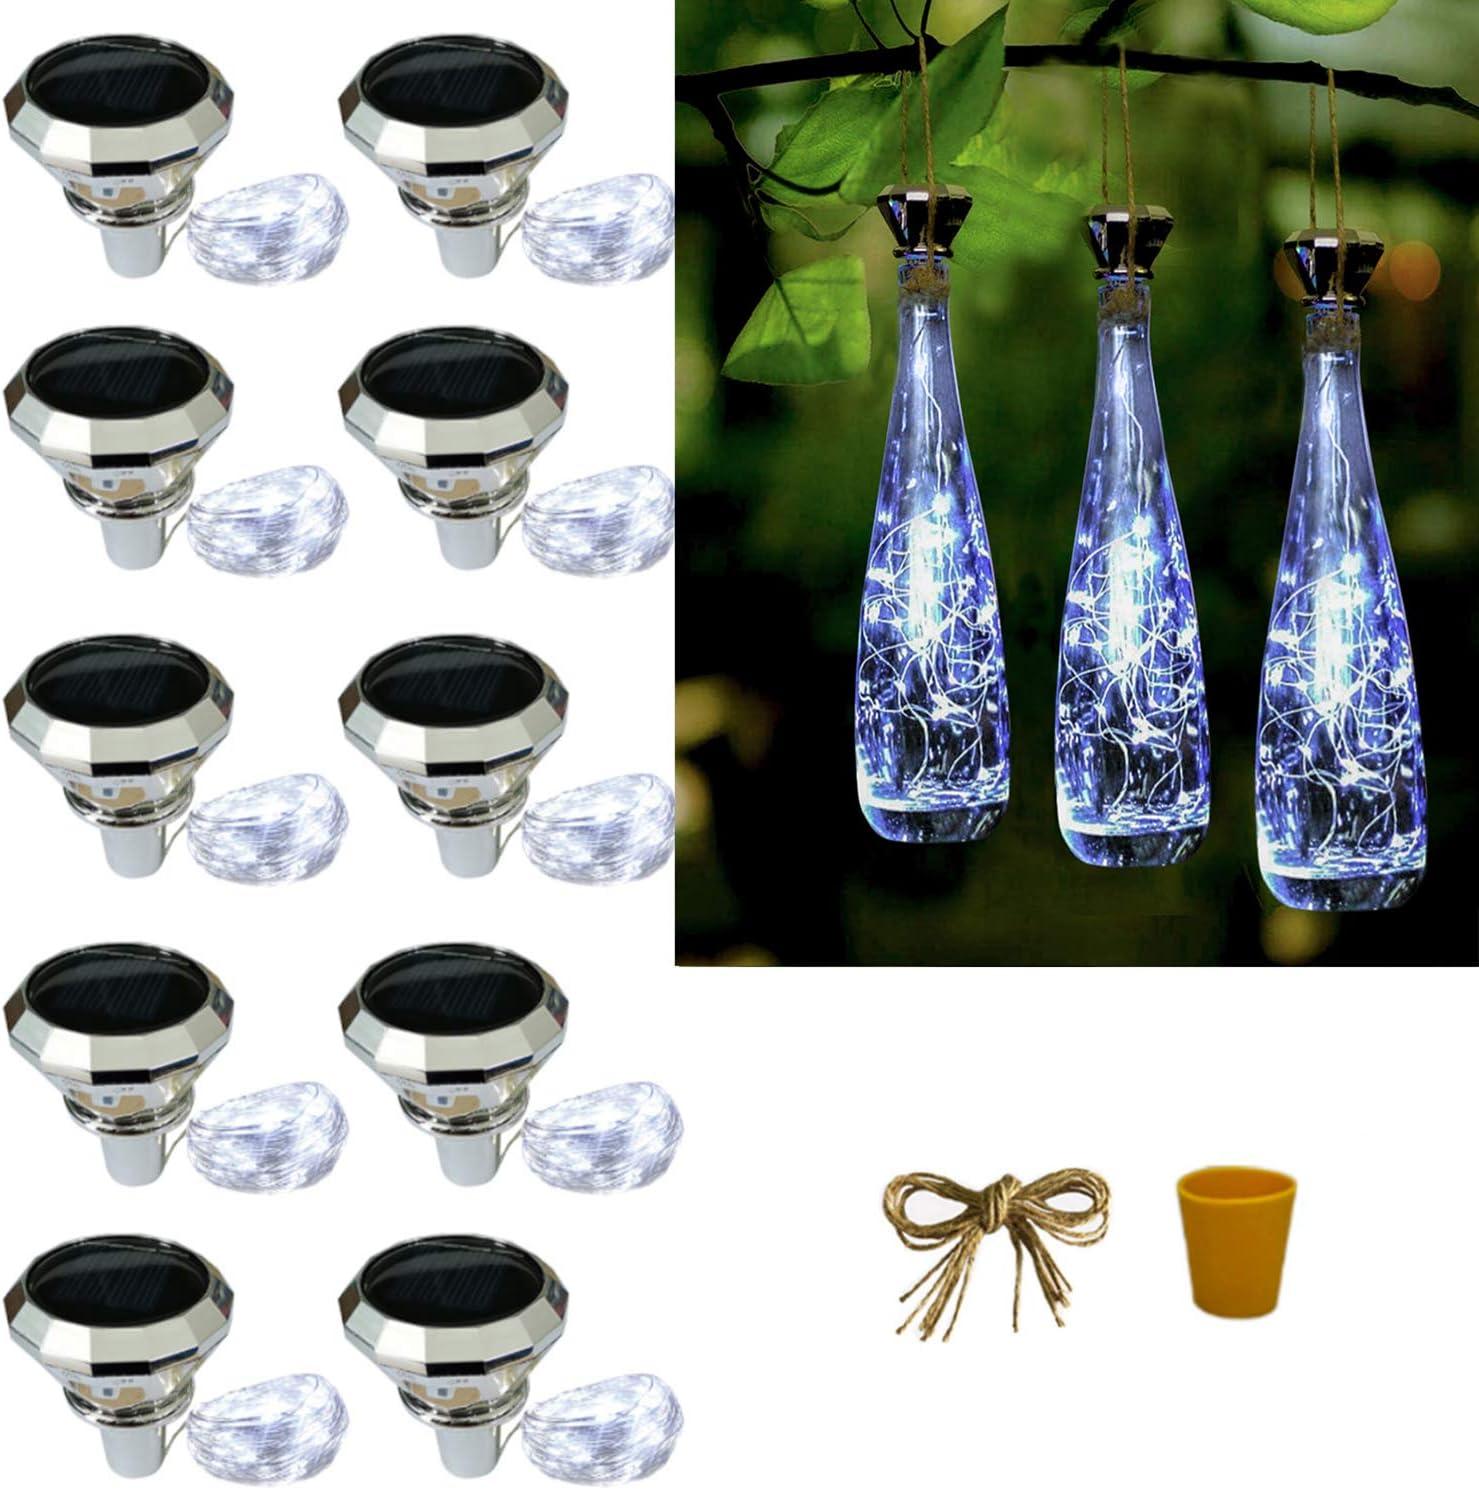 ZYLiWoo Starry Love Solar Bottle Lights,10 Pack Solar Diamond Wine Bottle Lights String, Outdoor Waterproof Cork Lights for Wedding Holiday Garden Patio Pathway Outdoor Wine Bottle Decorative (White)